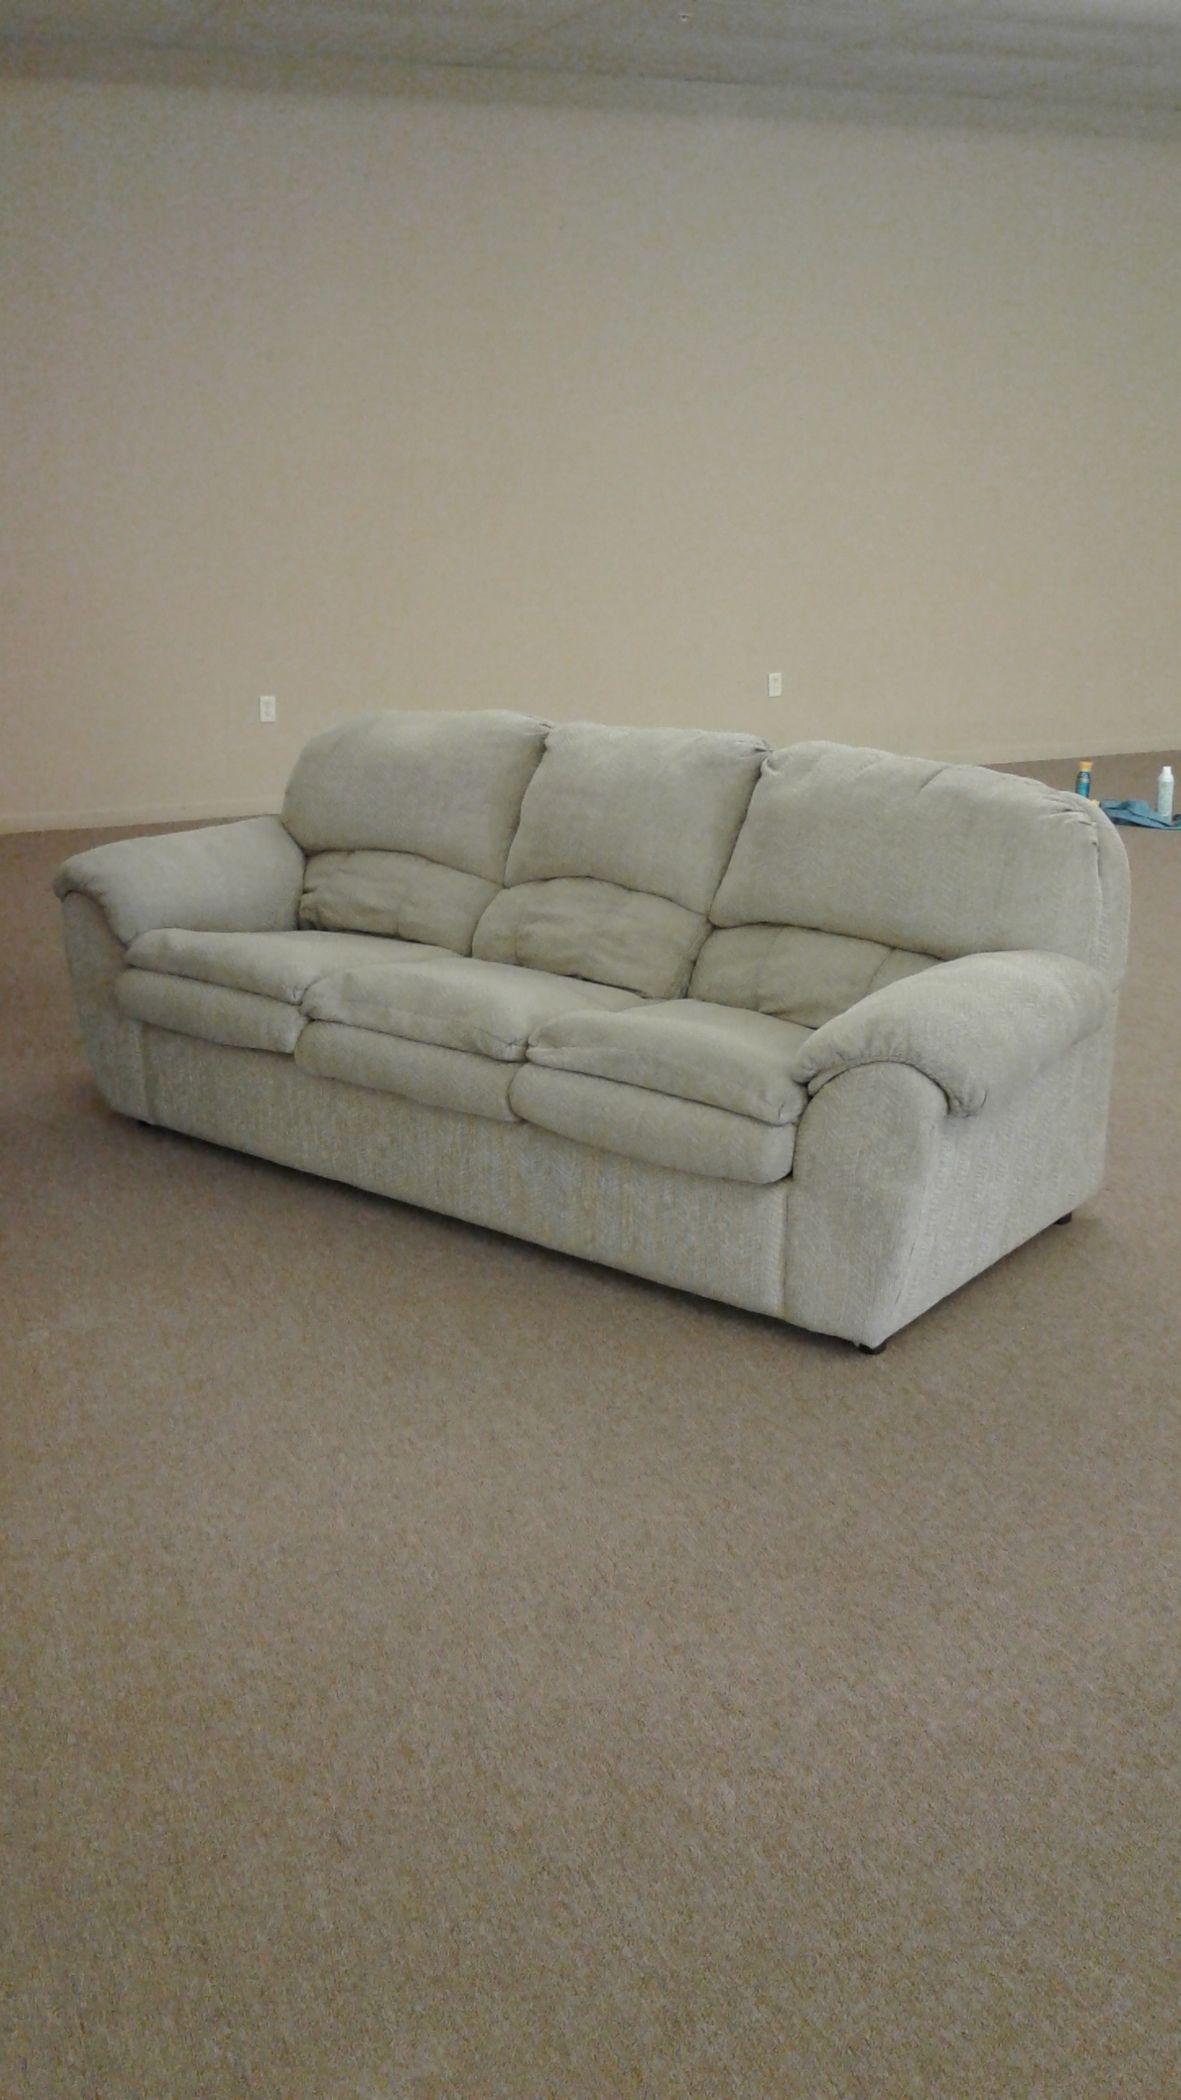 England Corsair Sleeper Sofa Delmarva Furniture Consignment